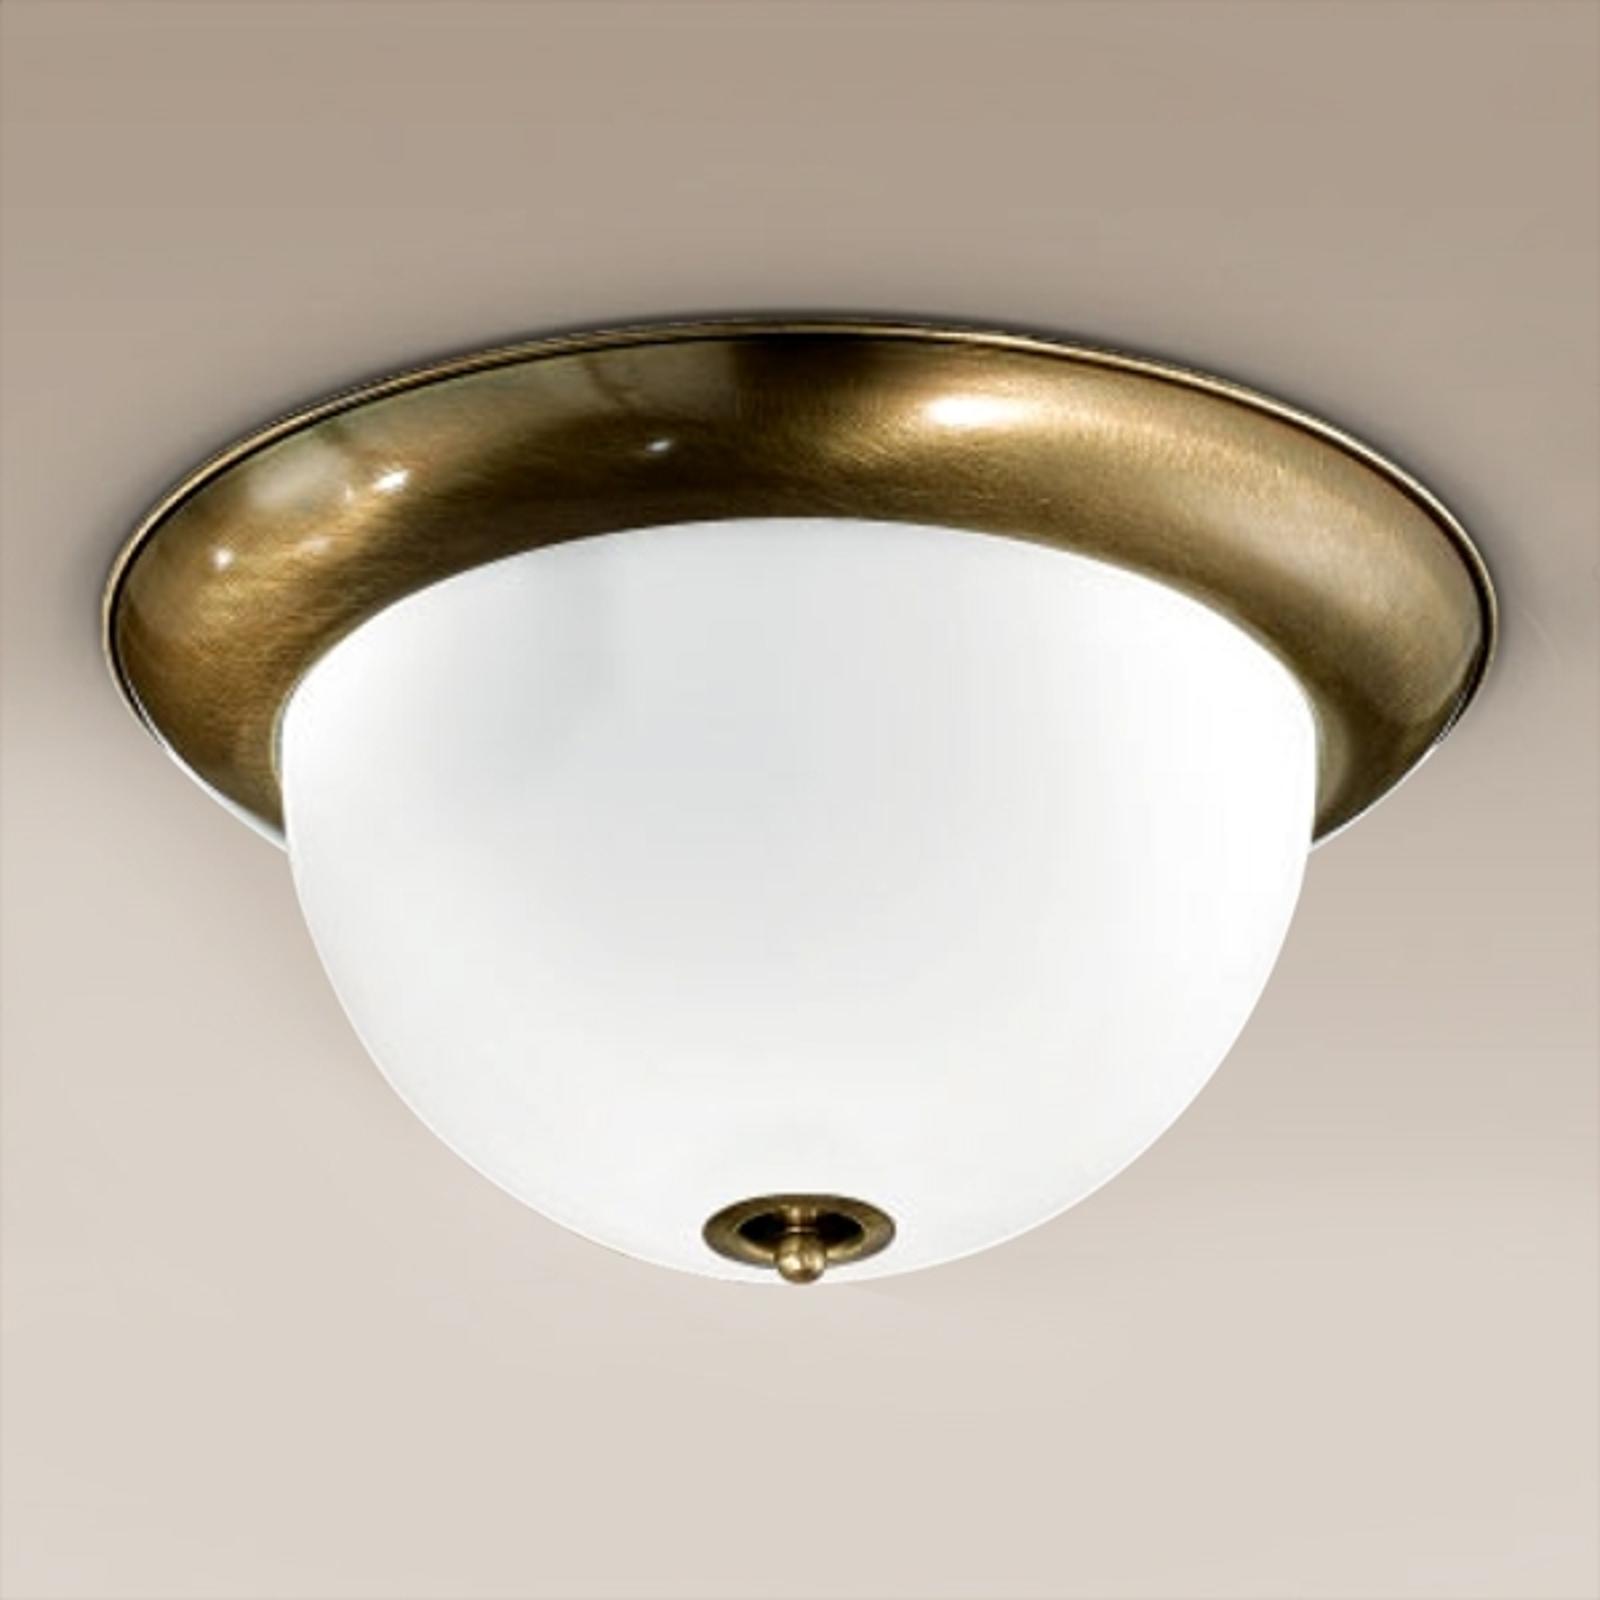 Klassieke plafondlamp Galleria